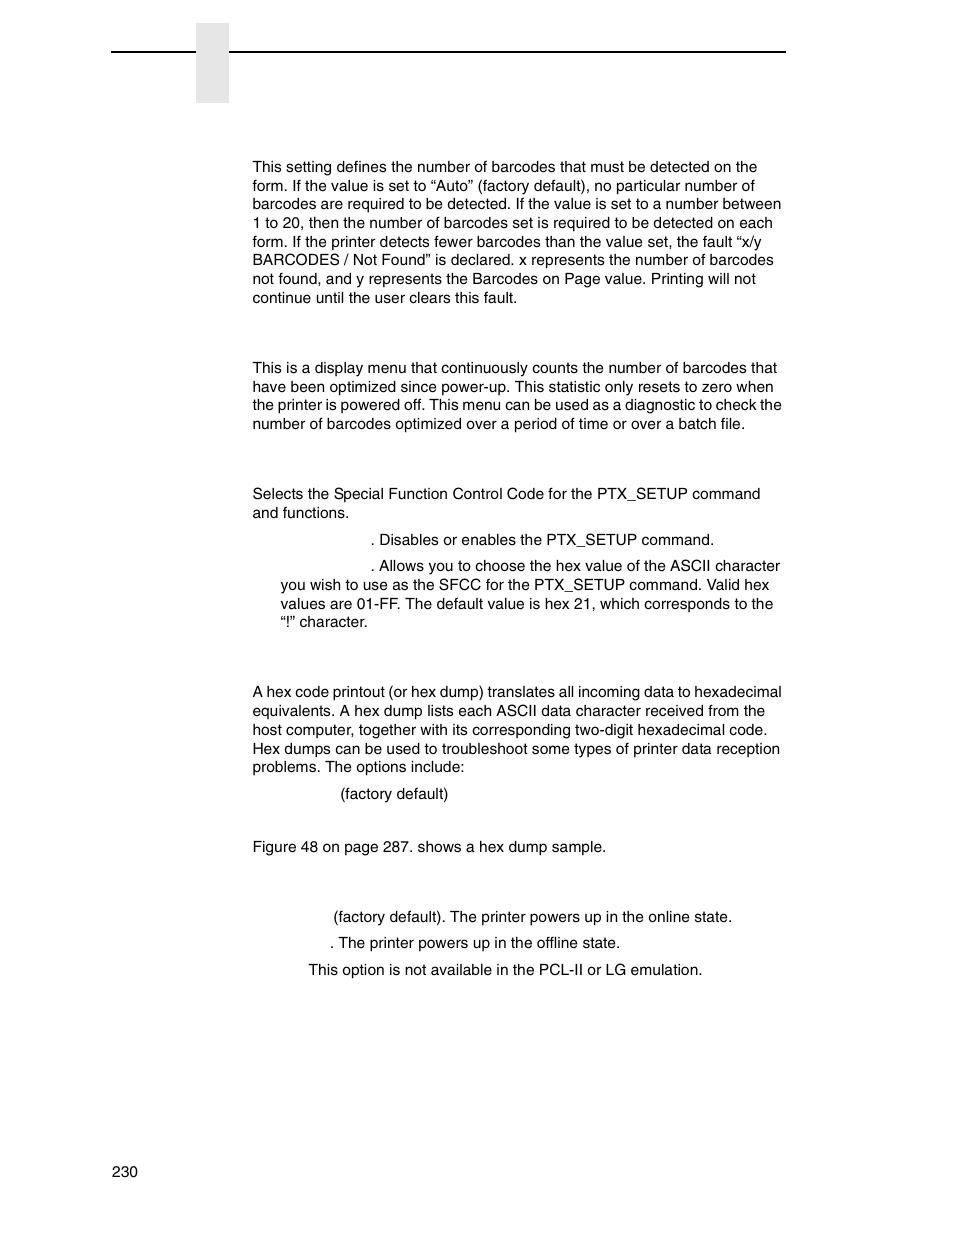 Barcodes on page, Bcodes optimized, Ptx_setup option | Printronix